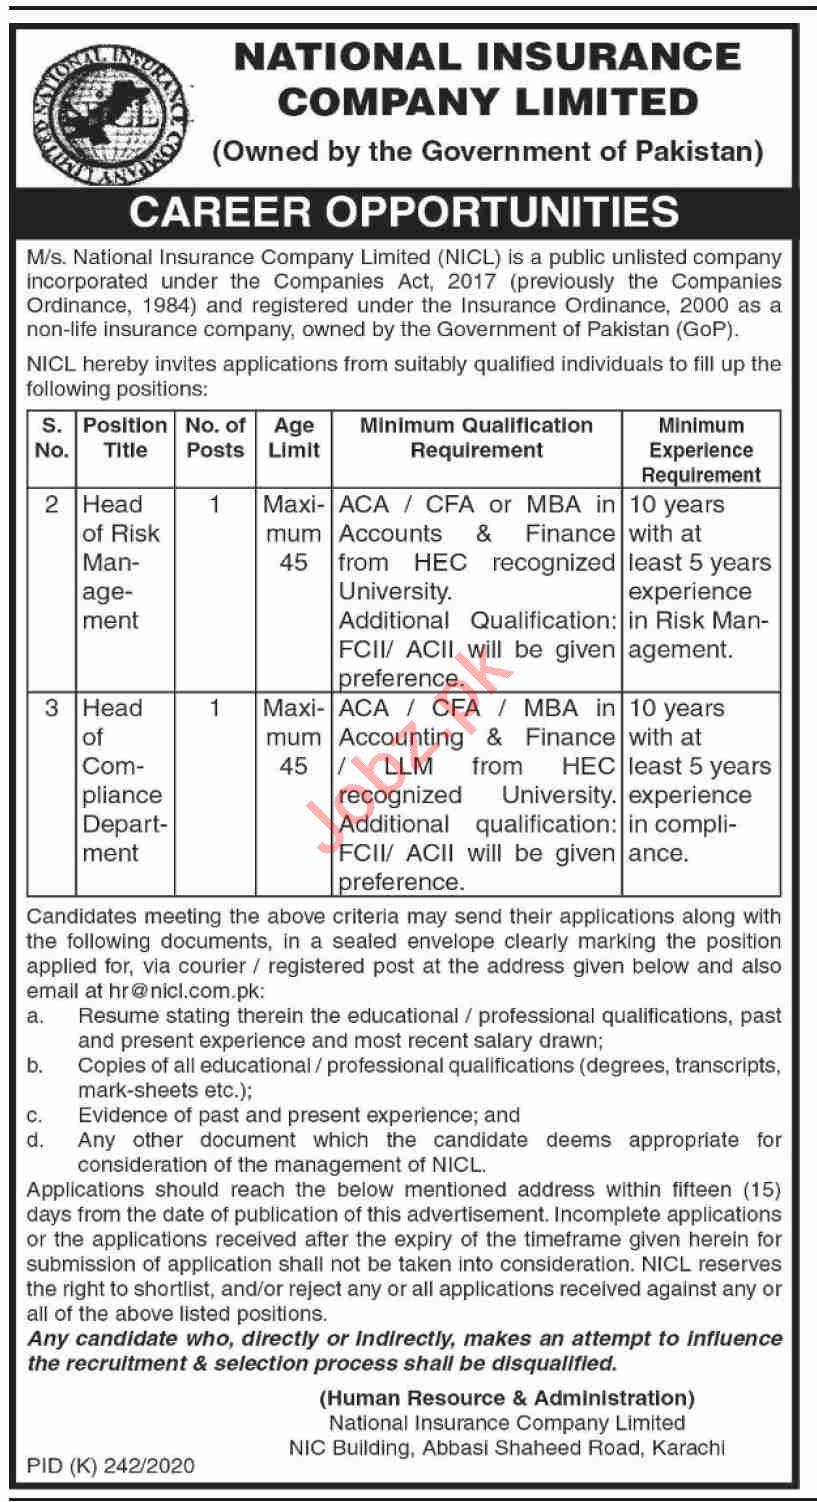 National Insurance Company Limited NICL Karachi Jobs 2020